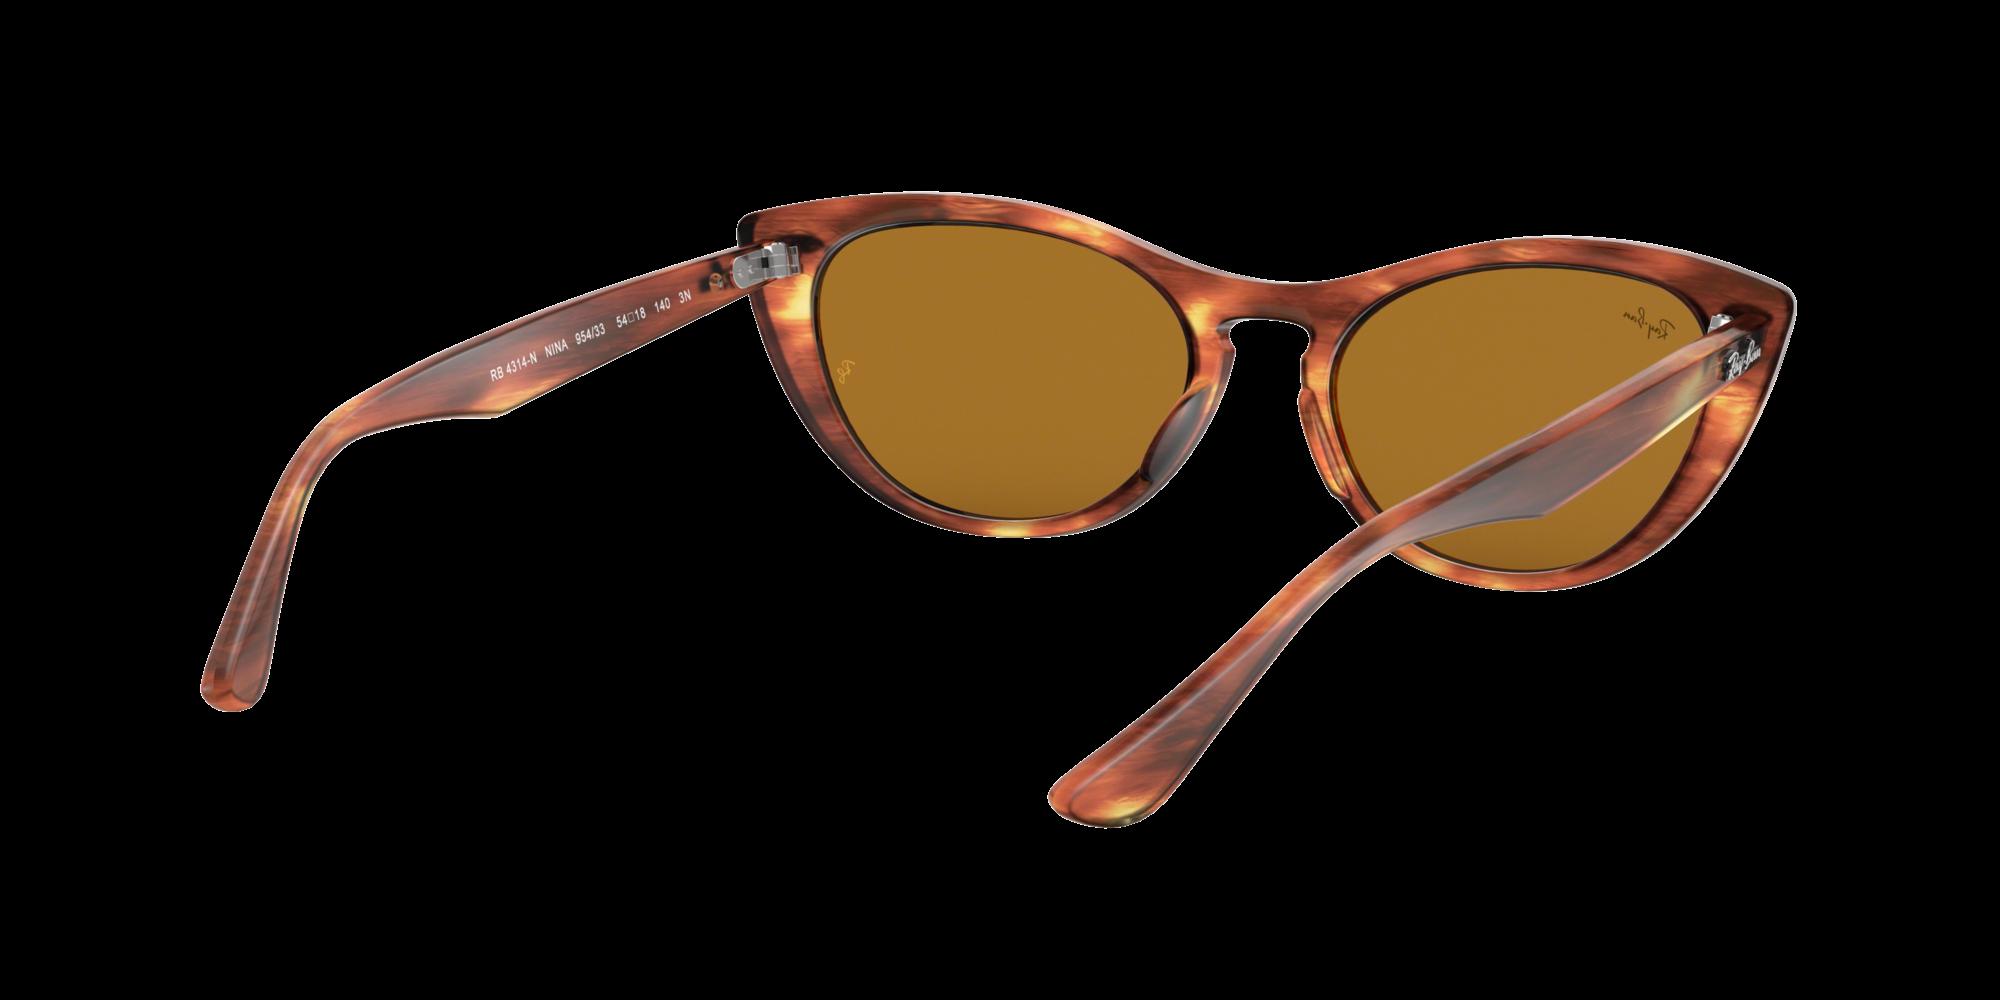 Sunglasses Ray-Ban Nina Tortoise RB4314N 954 33 54-18 Medium 160983802f0